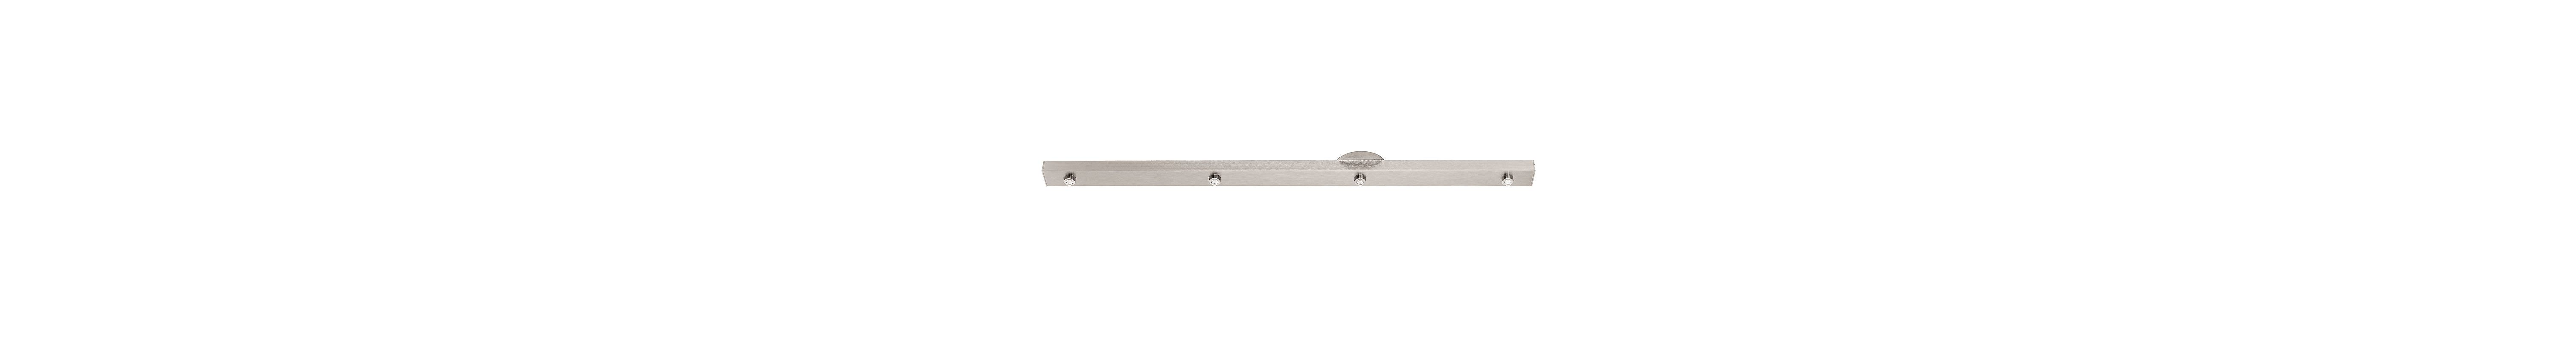 "Access Lighting 87104 UniJack 4 Light 38"" Wide Track Lighting Canopy"